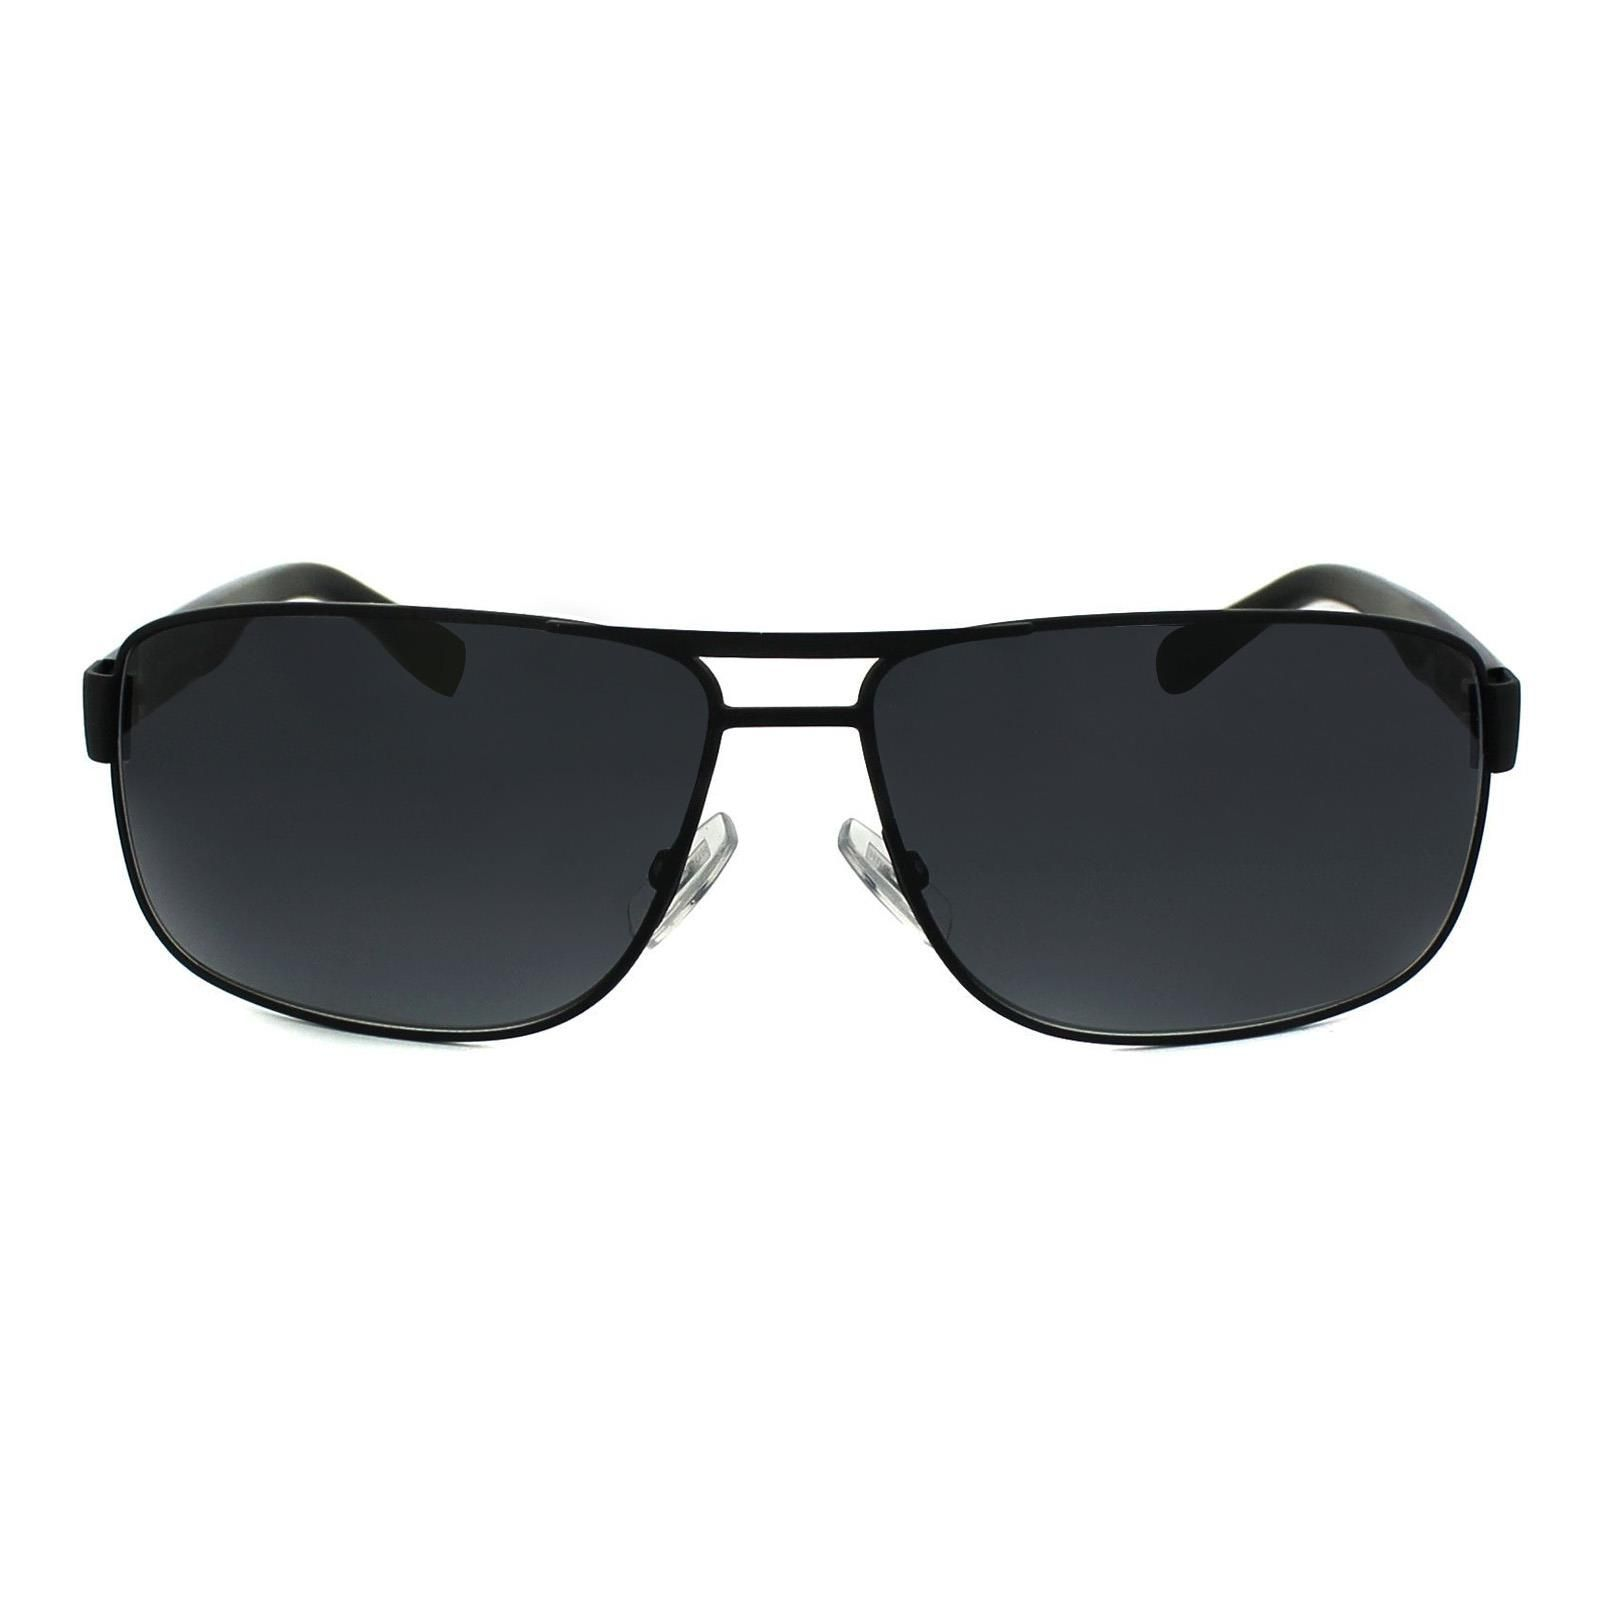 Hugo Boss Sunglasses 0668 10G HD Matt Black Grey Gradient